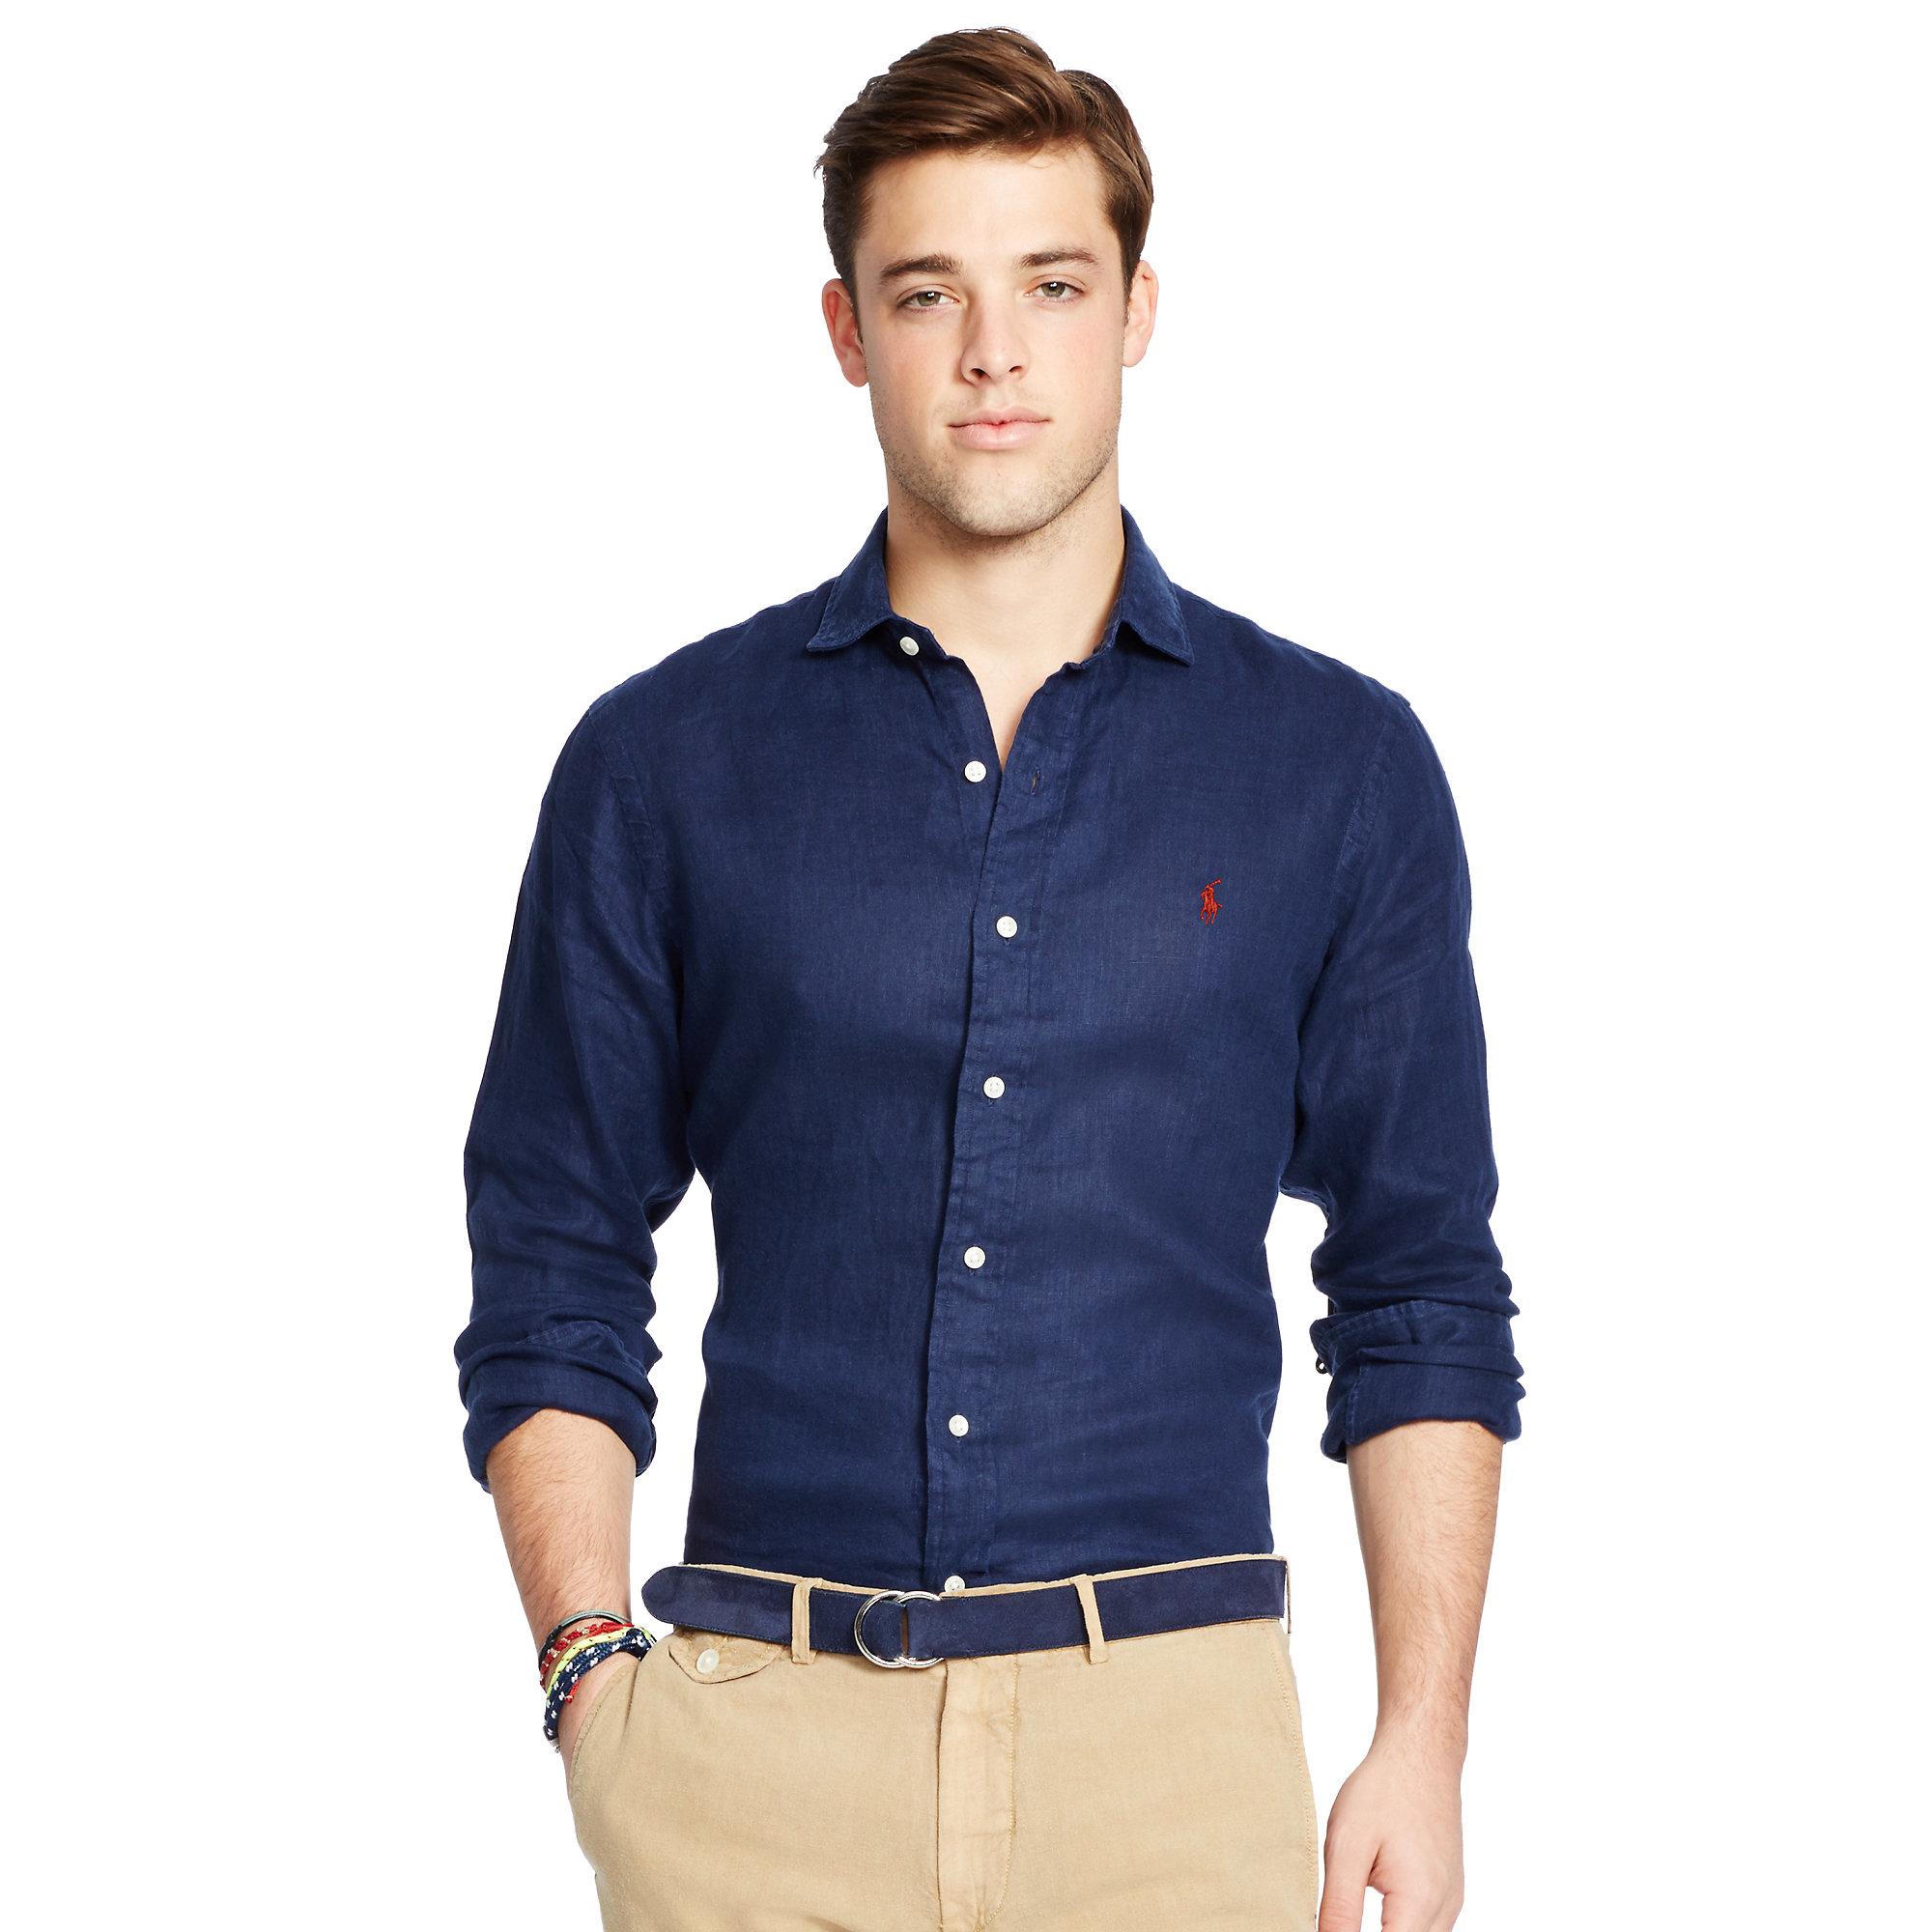 f69aca76 Men's Polo Shirts Including Bobby Jones, Polo by Ralph Lauren and Izod :  EBTH